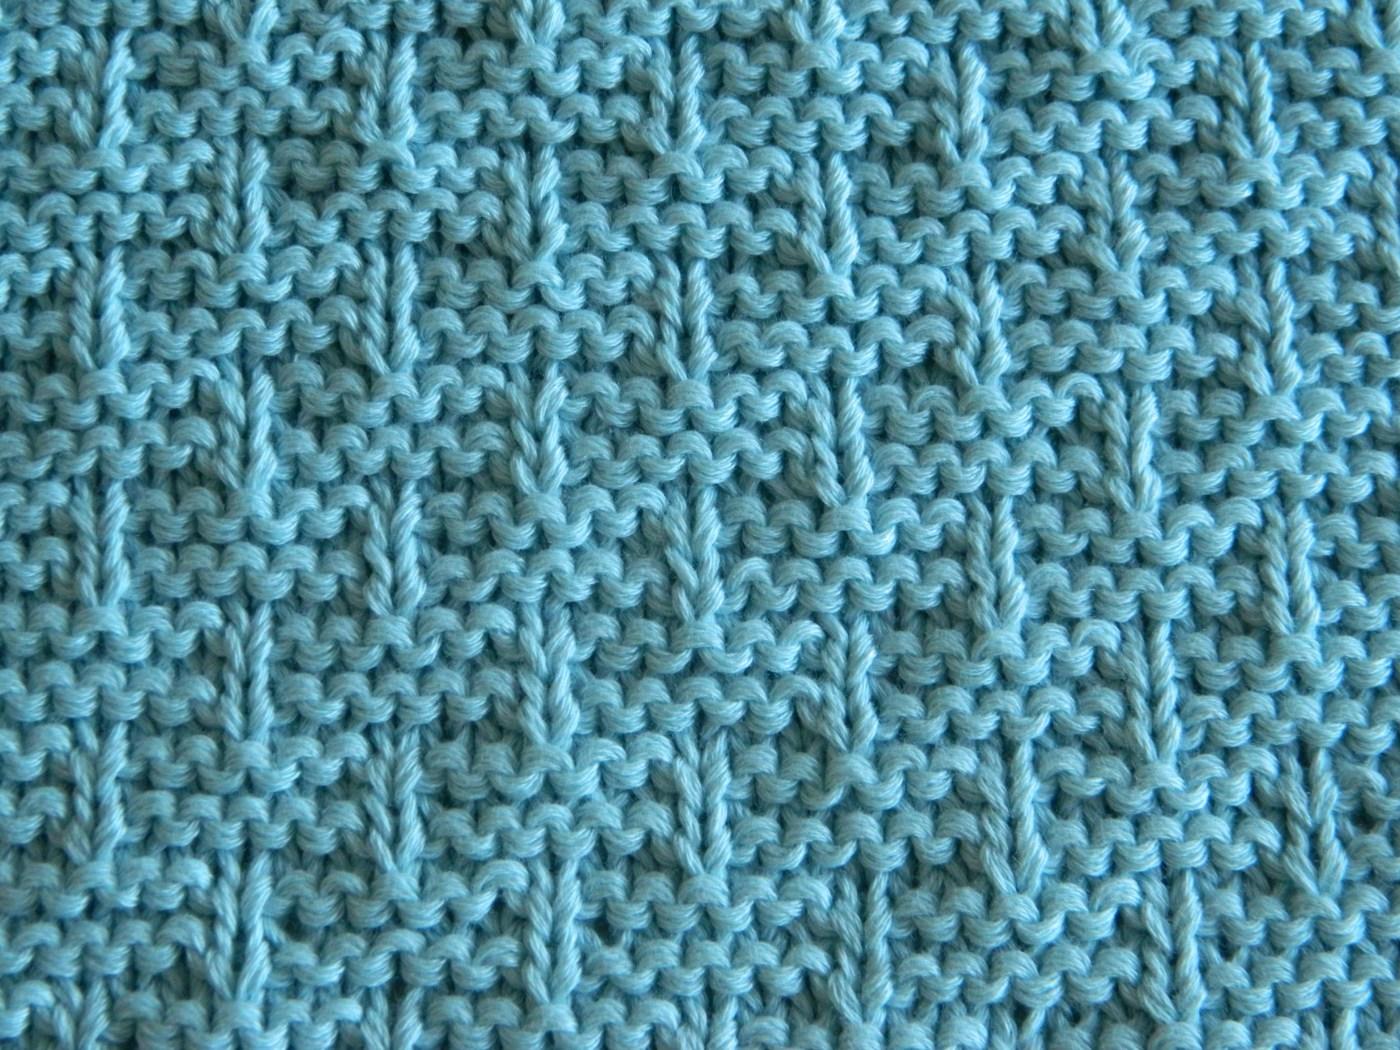 block 3 for 12 blocks of Xmas blanket Close up